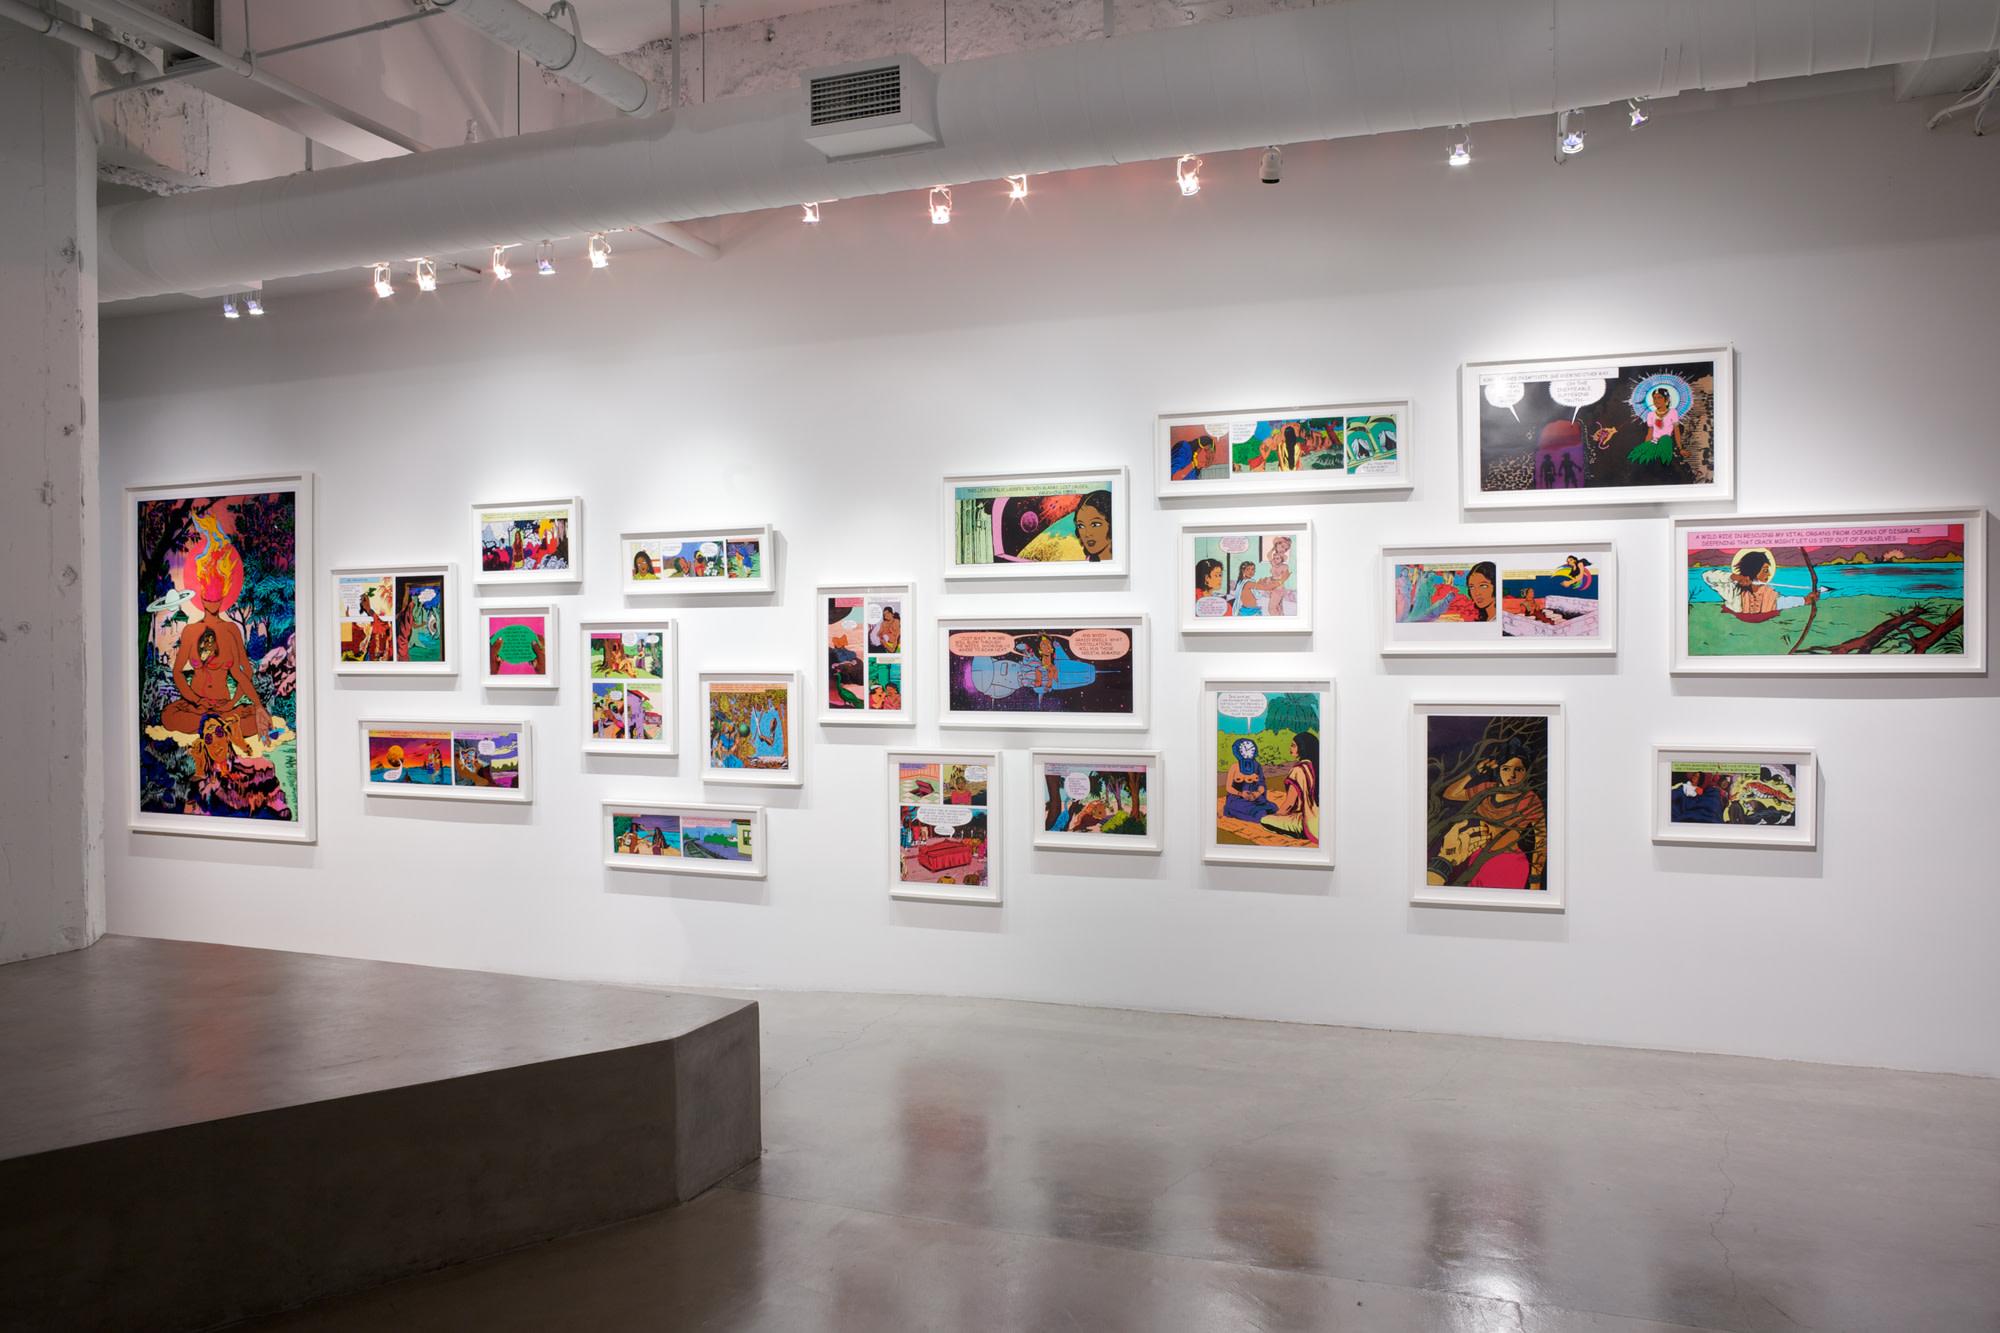 Installation view, 'Flickering Myths' at Gallery Wendi Norris, San Francisco, November 1 — December 22 2012